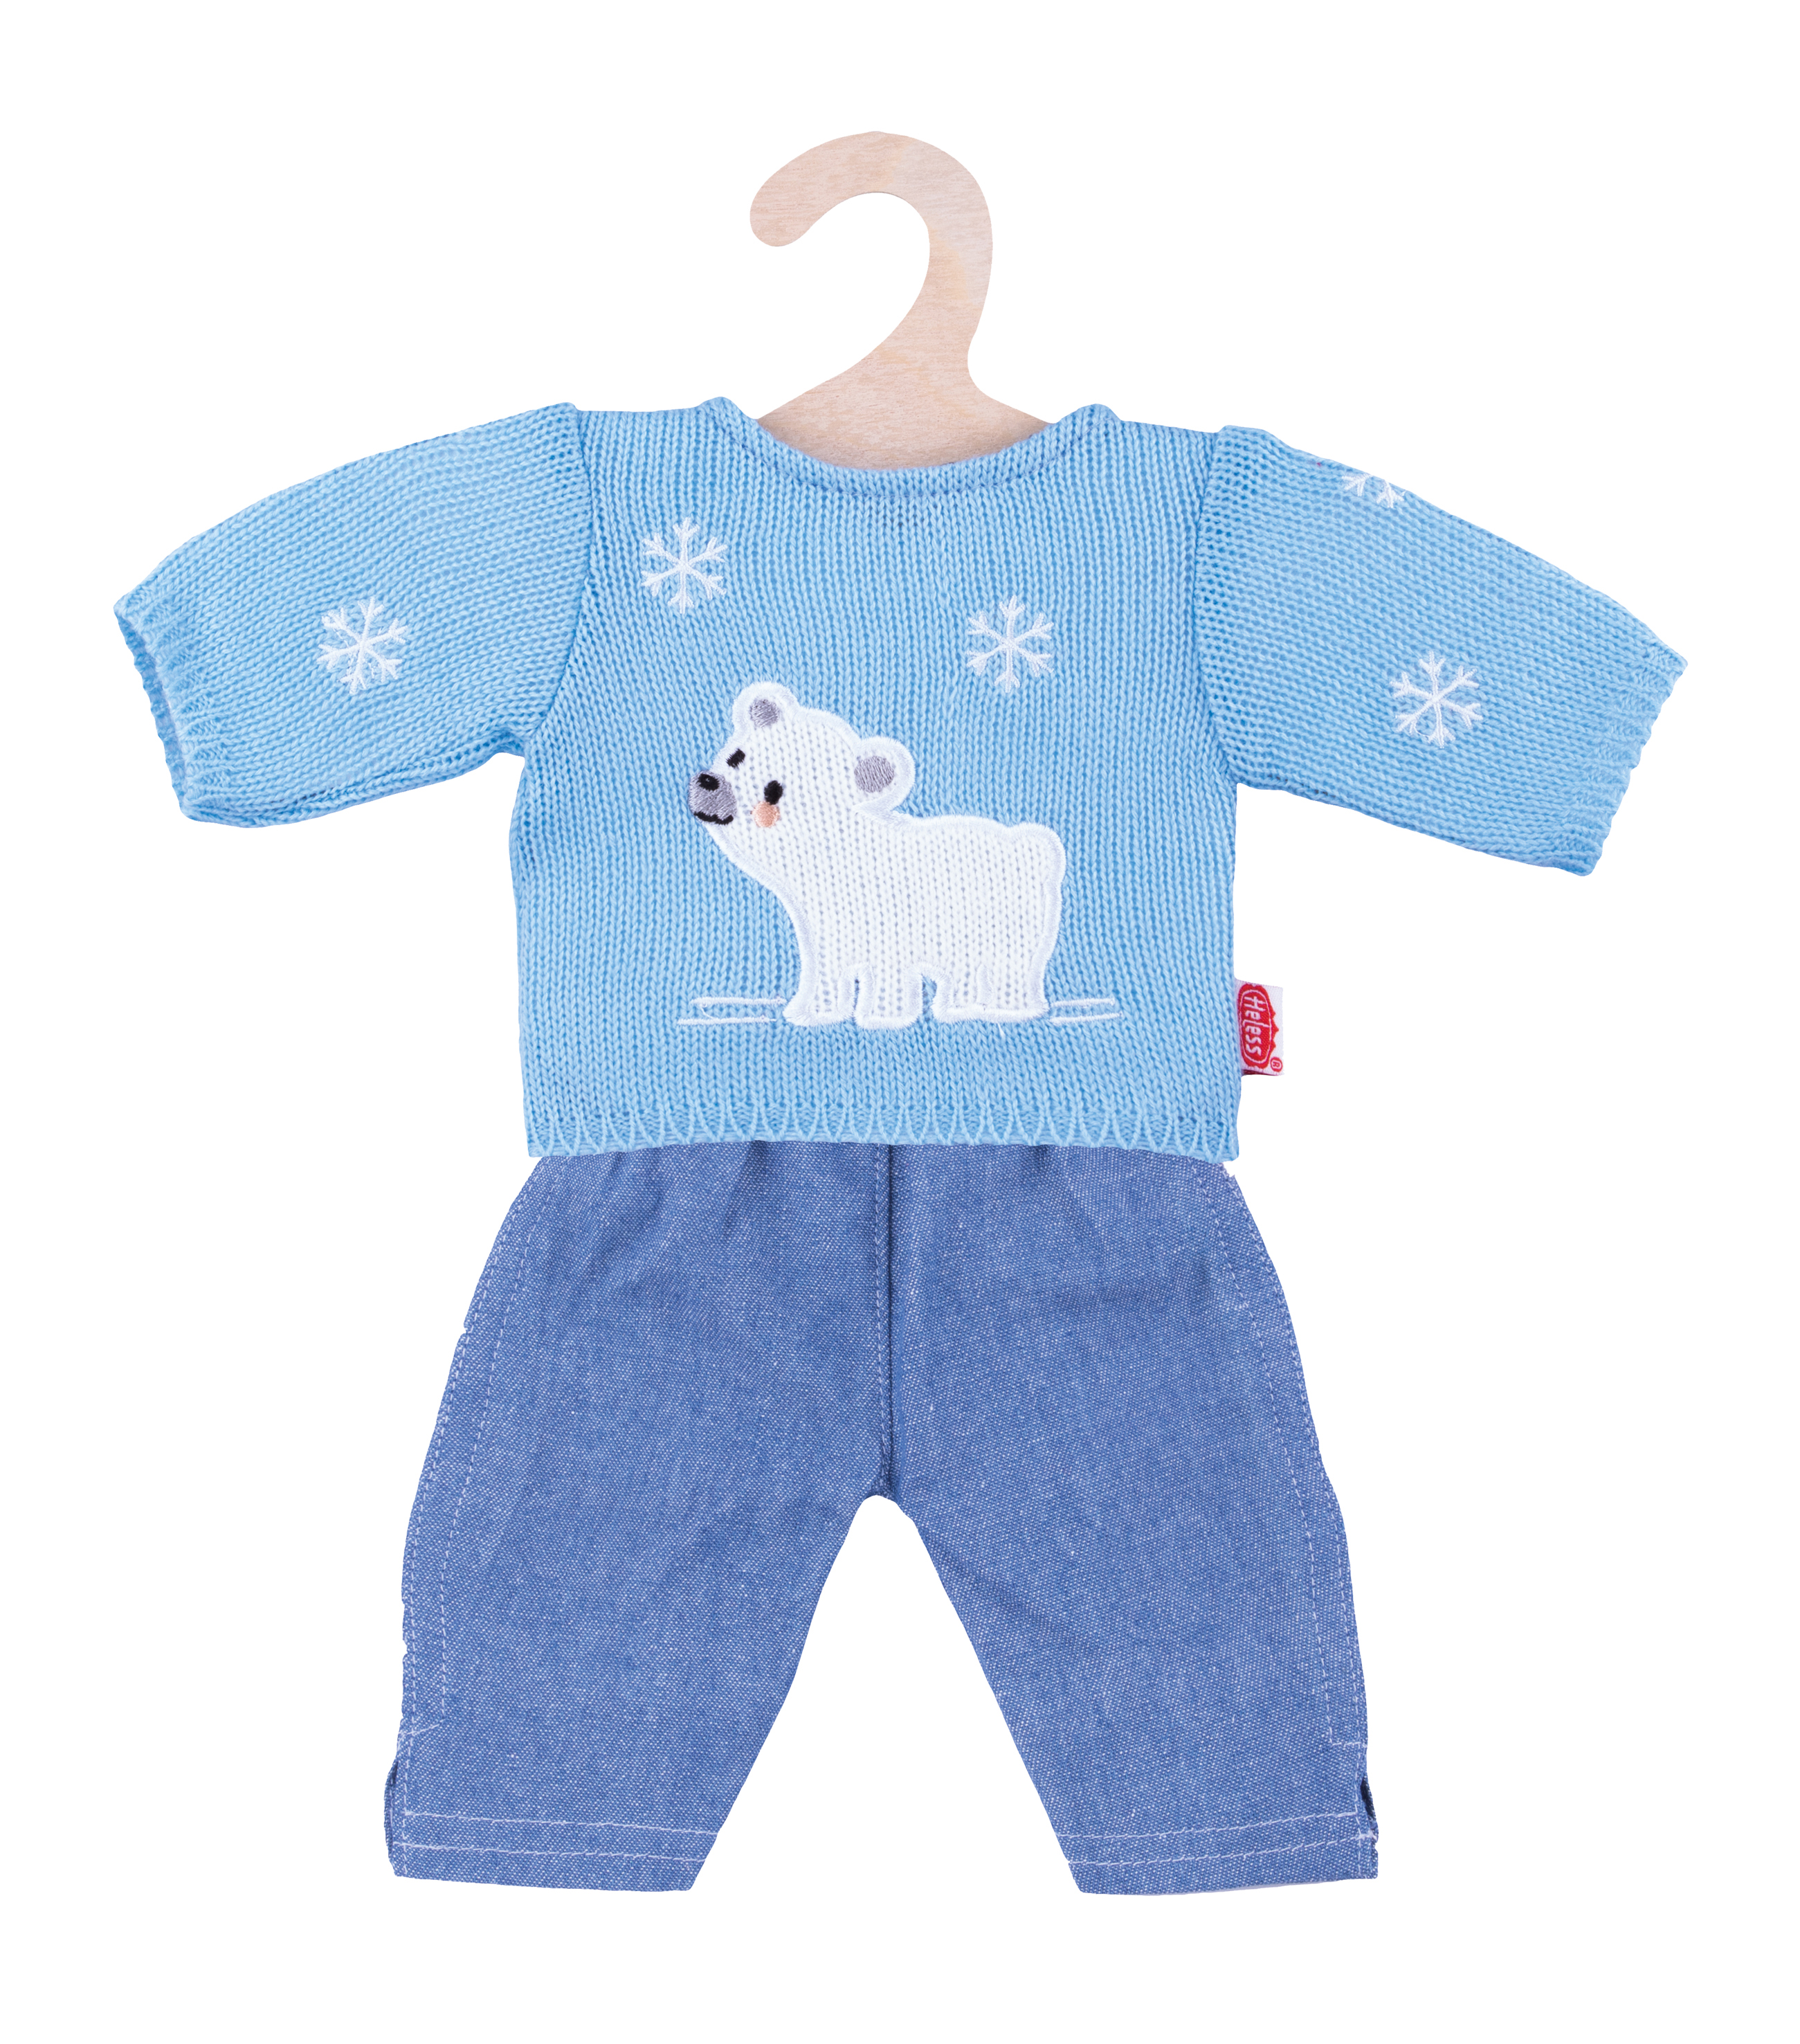 "Pullover ""Eisbär"" mit Jeans, Gr. 35-45 cm"